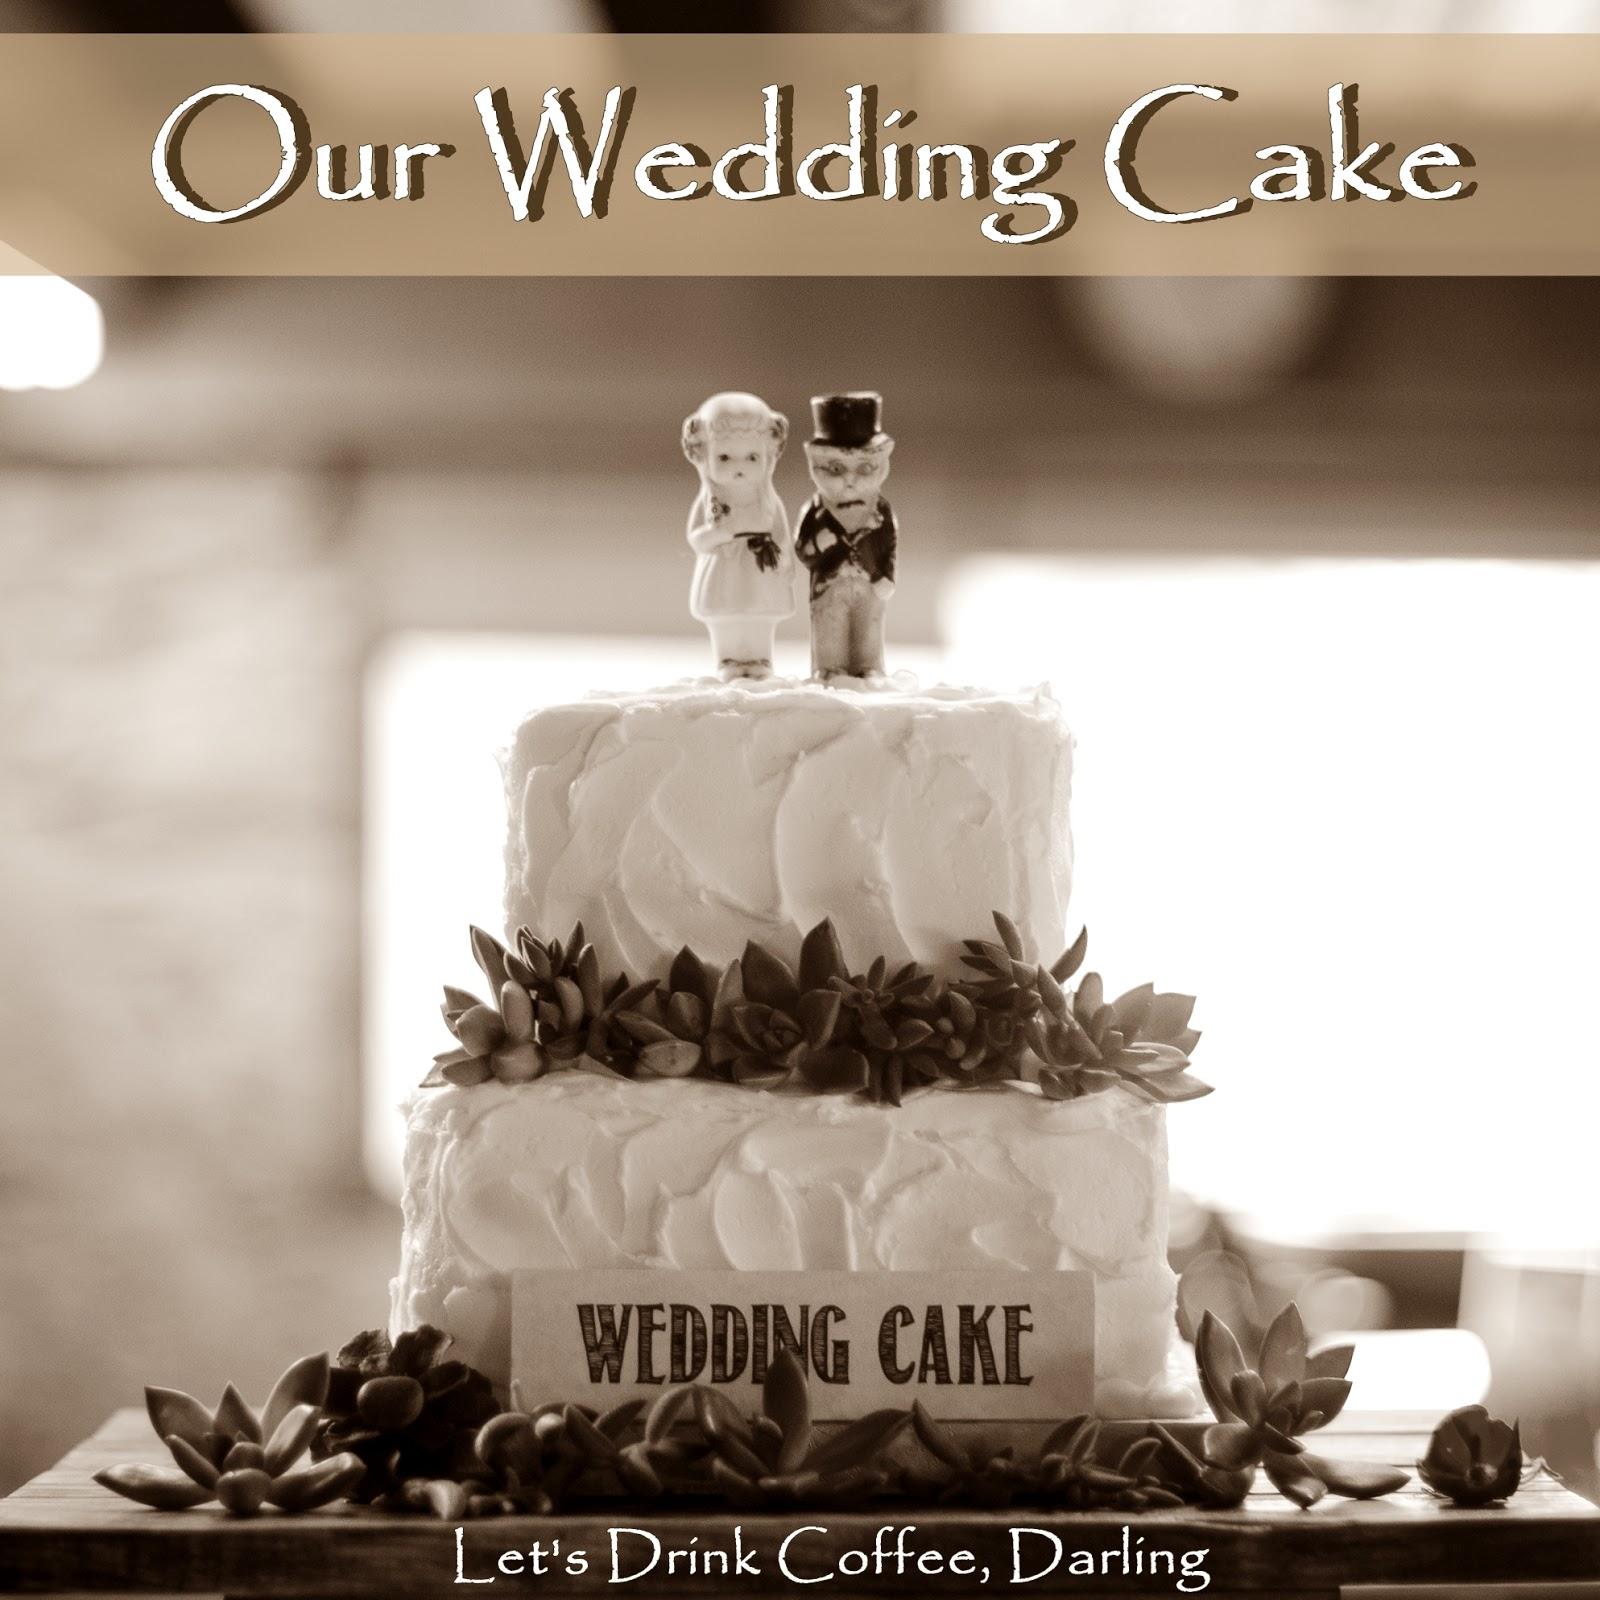 Let's Drink Coffee, Darling: Wedding Cake, Cupcakes